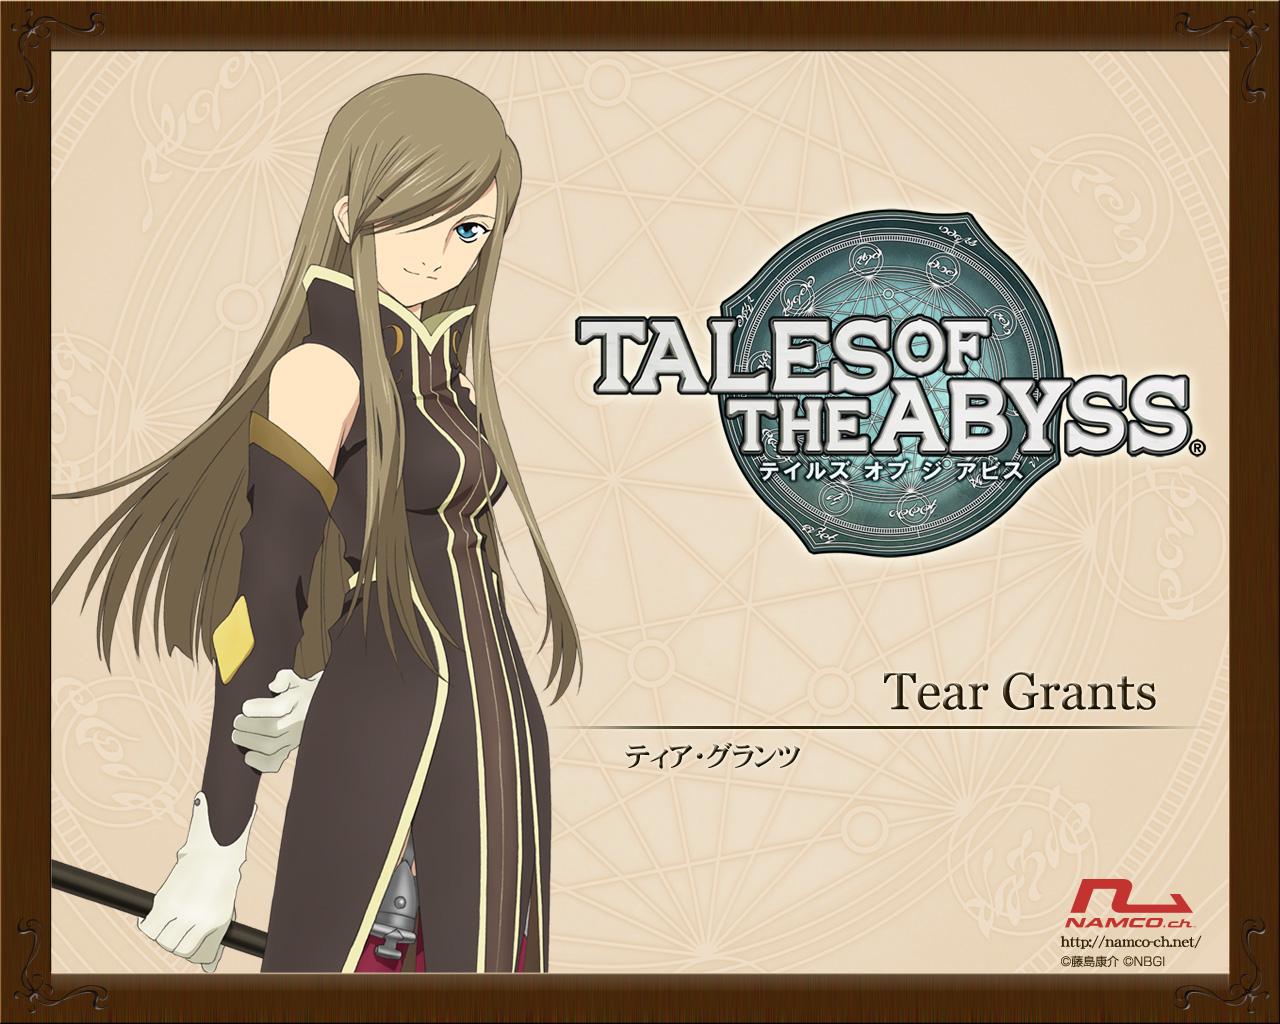 Tear Grants 1280x1024